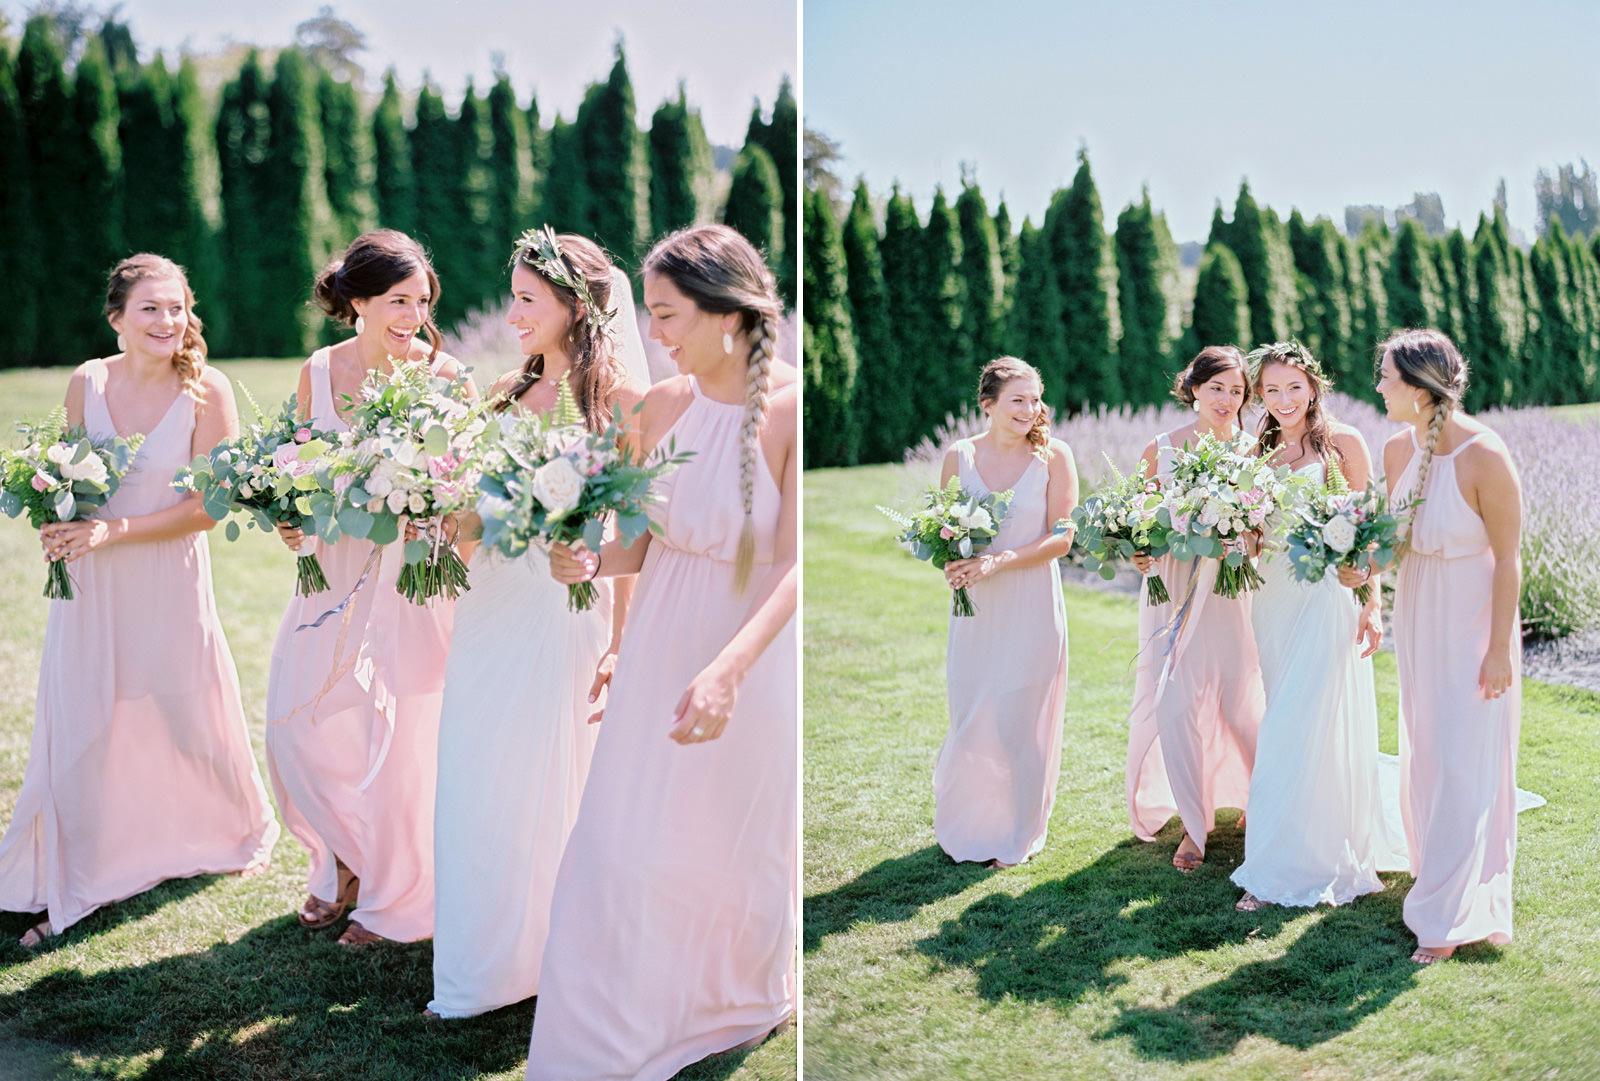 114-woodinville-lavendar-farm-wedding-with-golden-glowy-photos.jpg